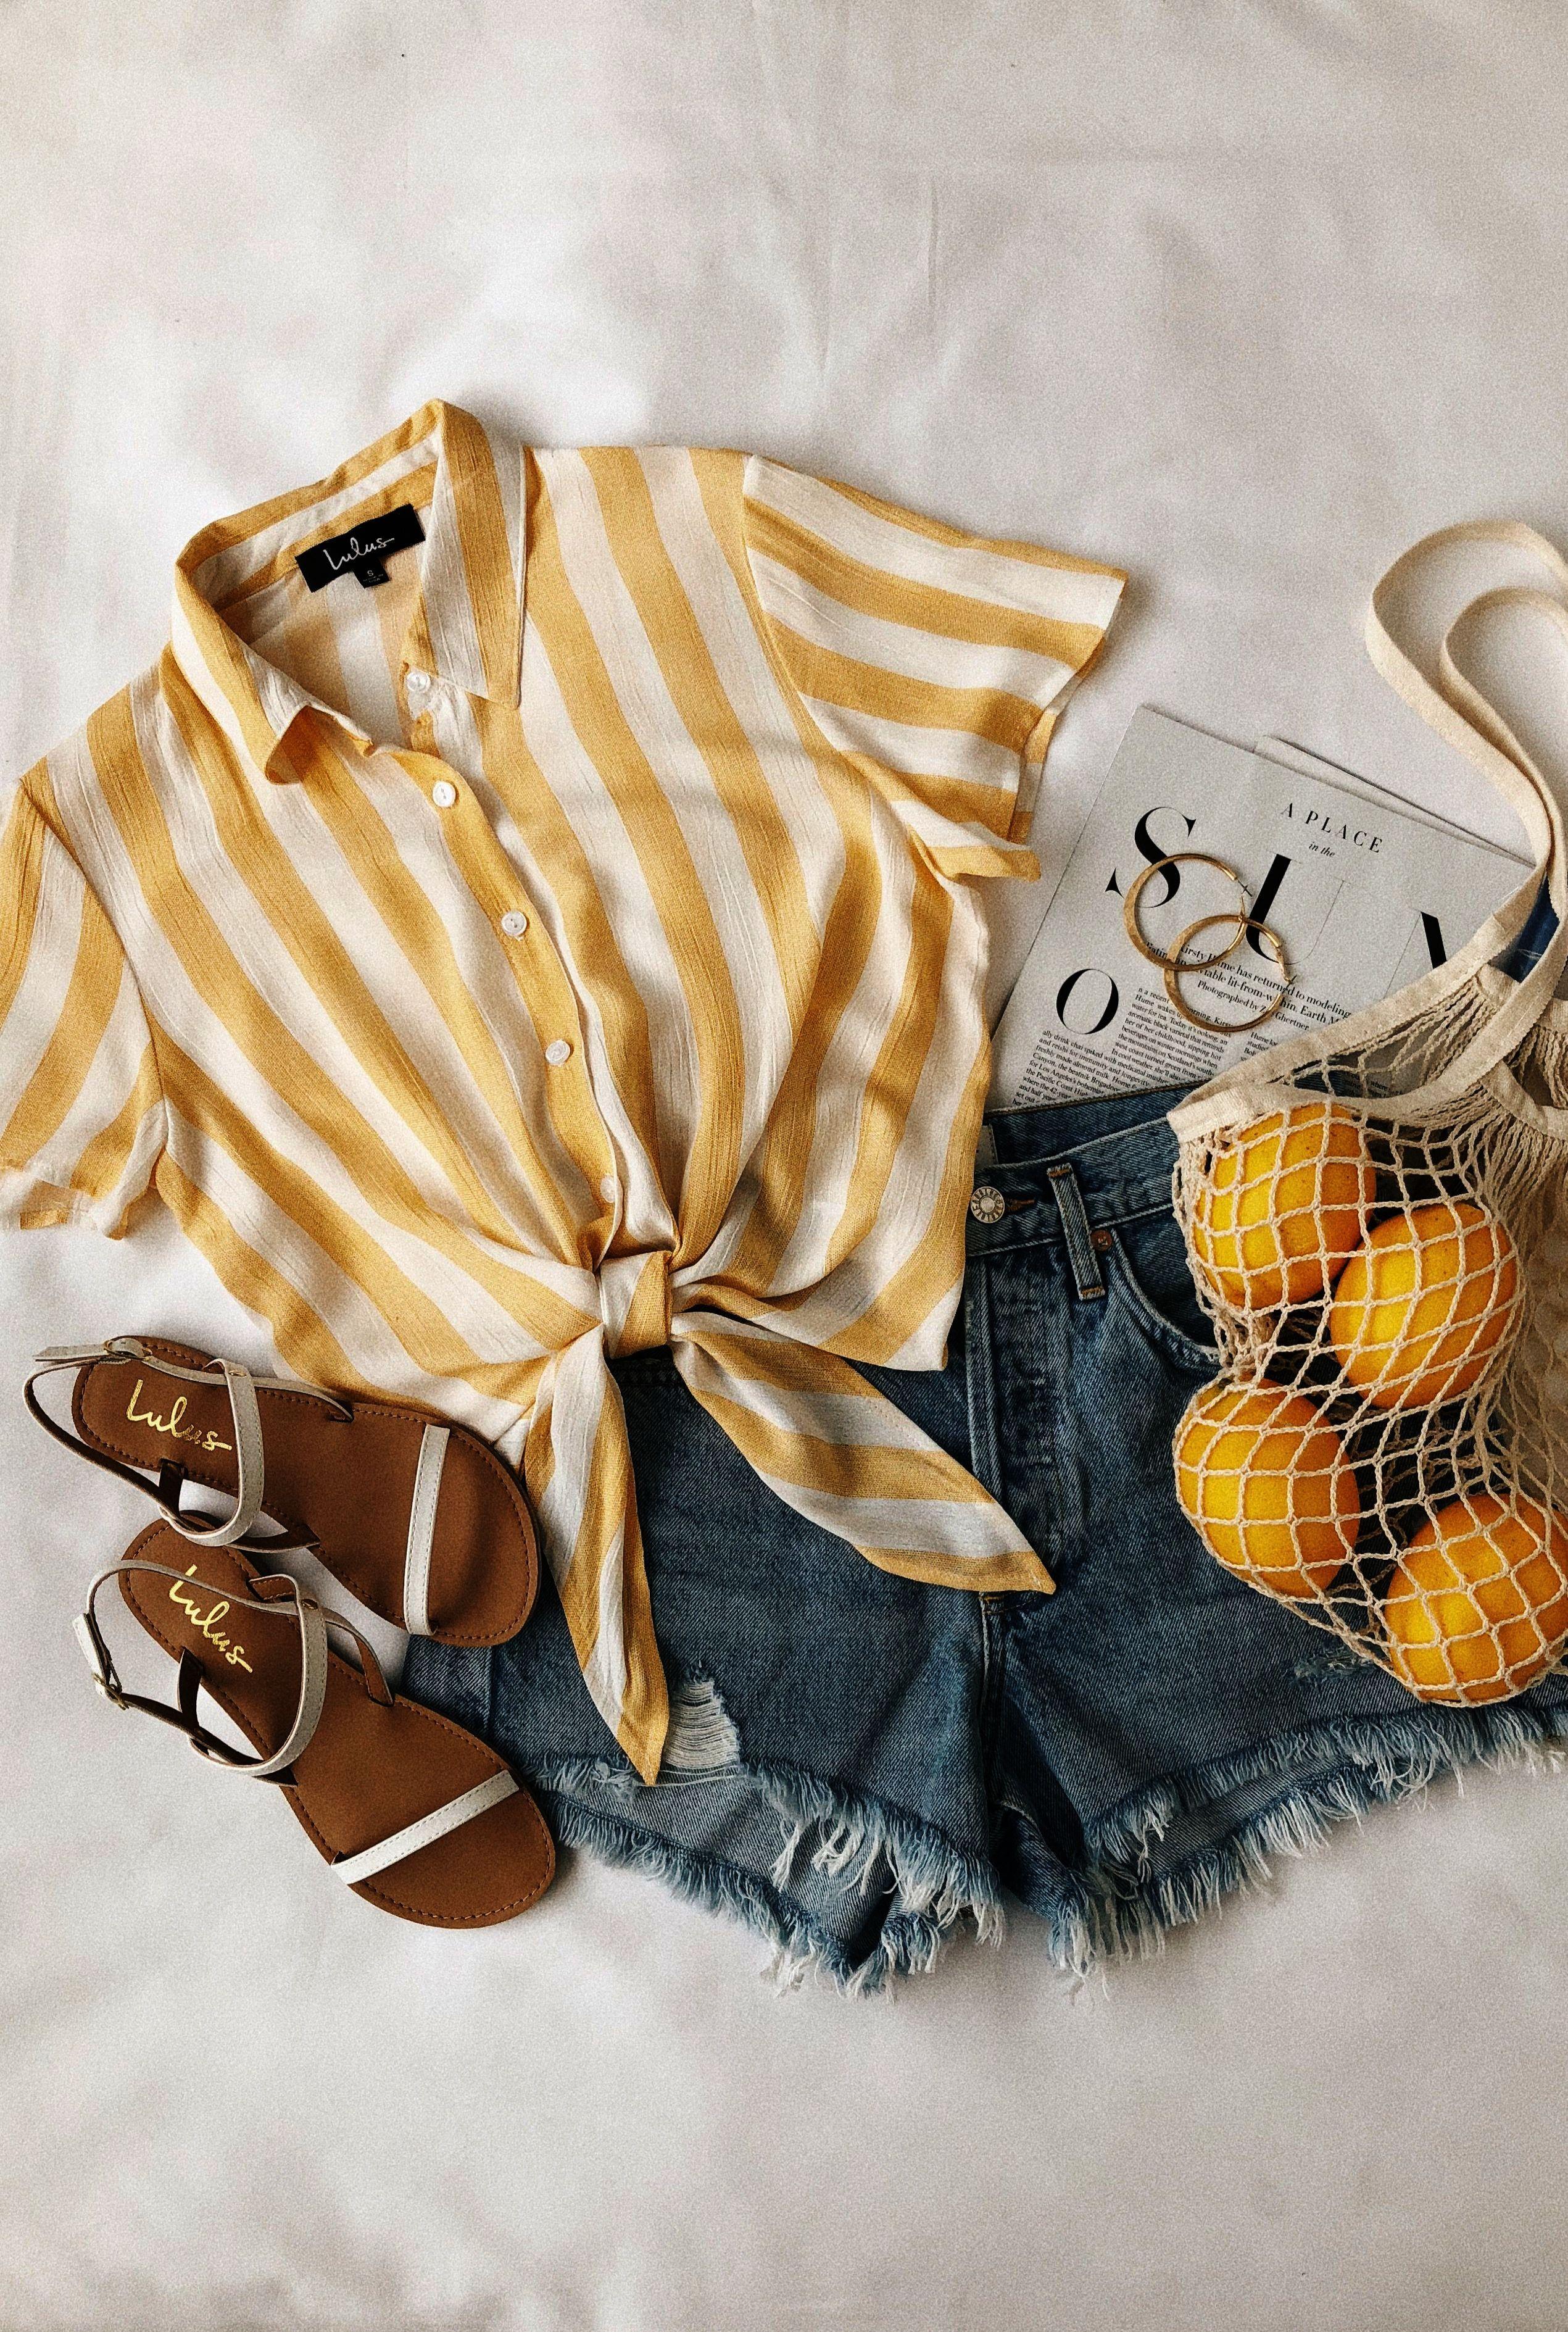 087f1aef233e Summer Style Herren Summer Clothes Life Hacks